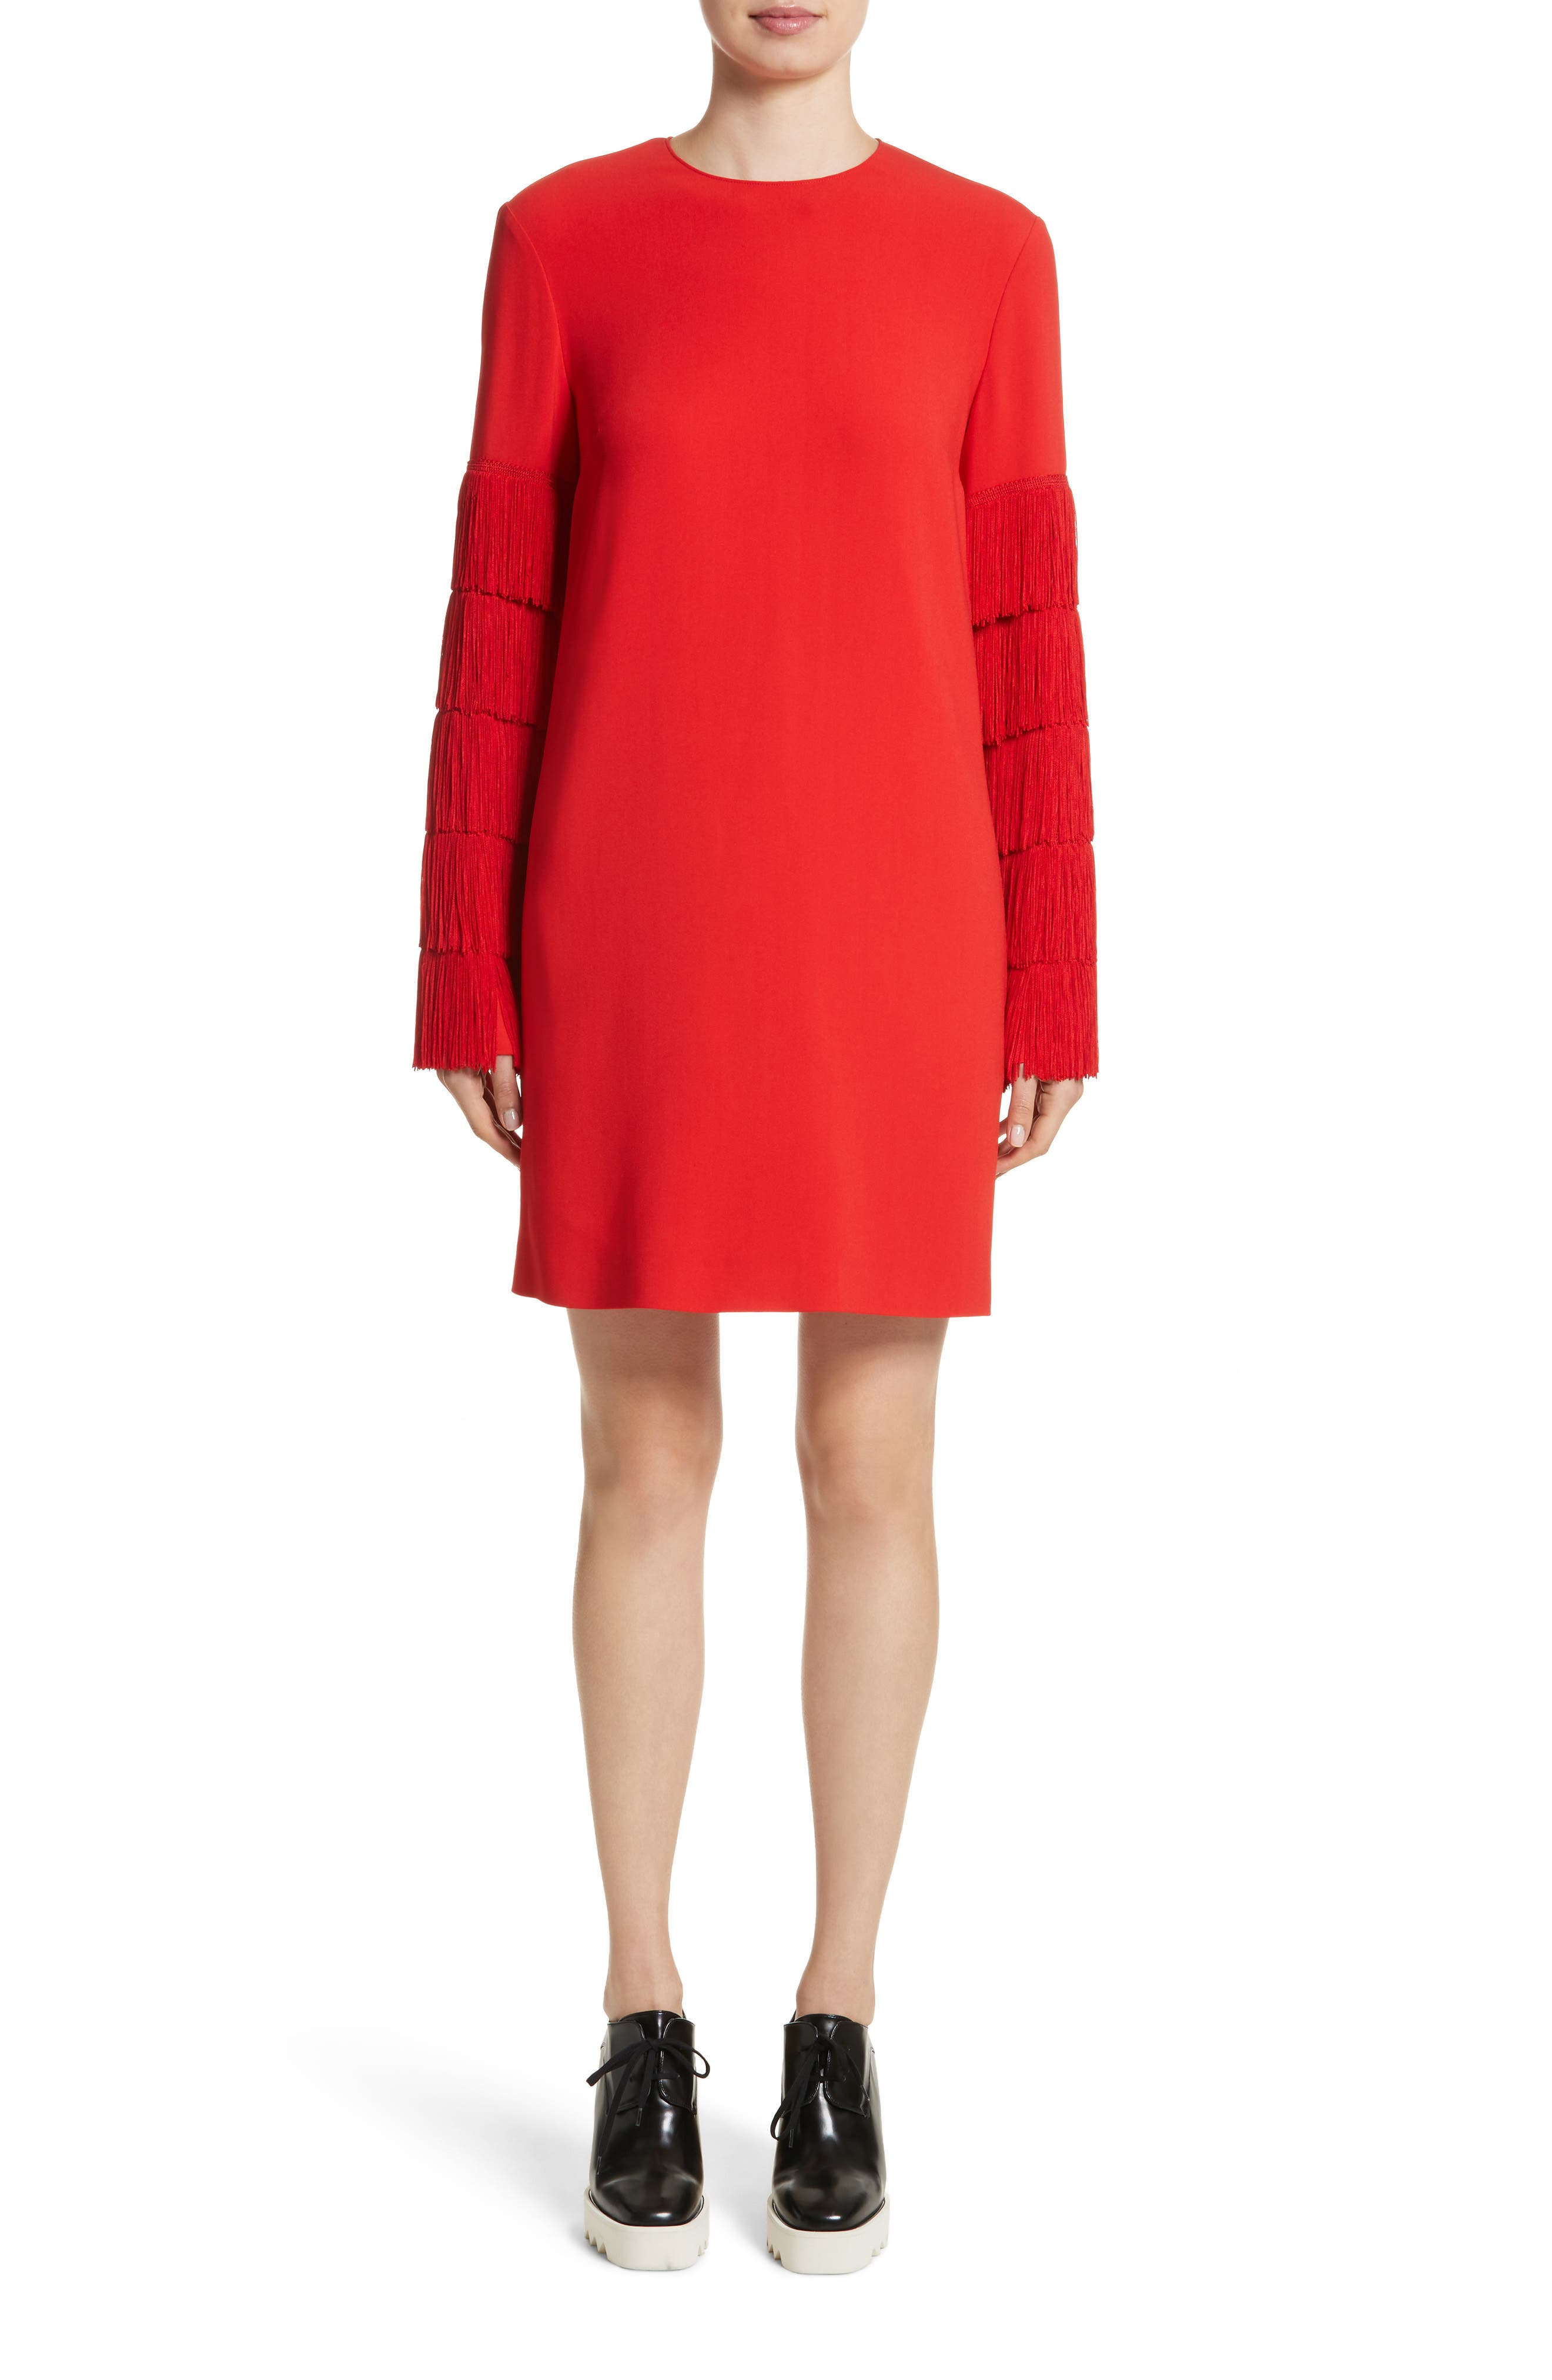 Alternate Image 1 Selected - Stella McCartney Fringe Sleeve Stretch Cady Dress